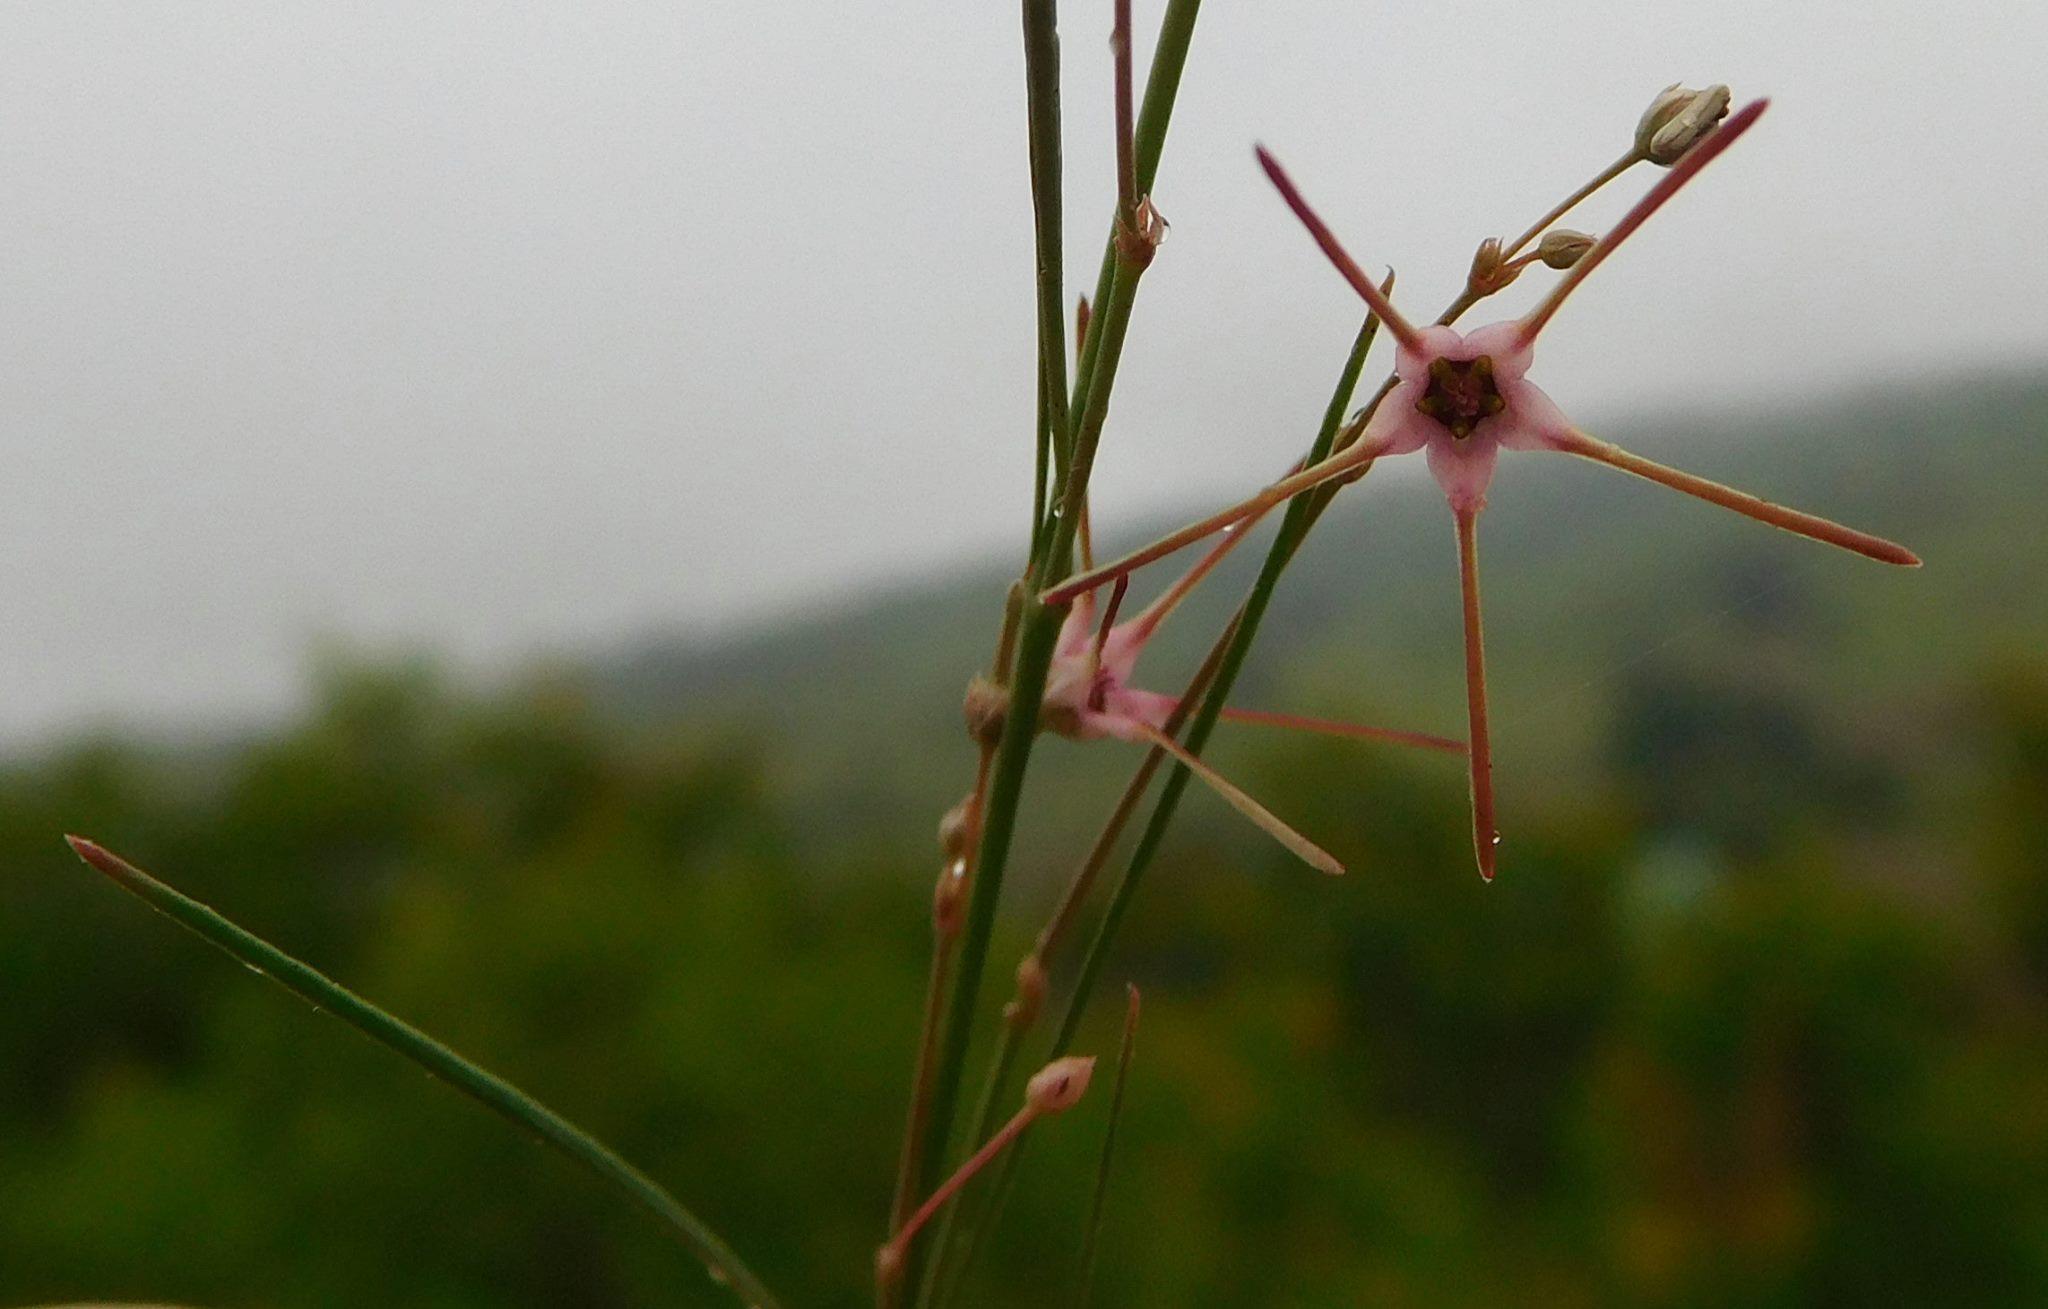 Brachystelma filifolium